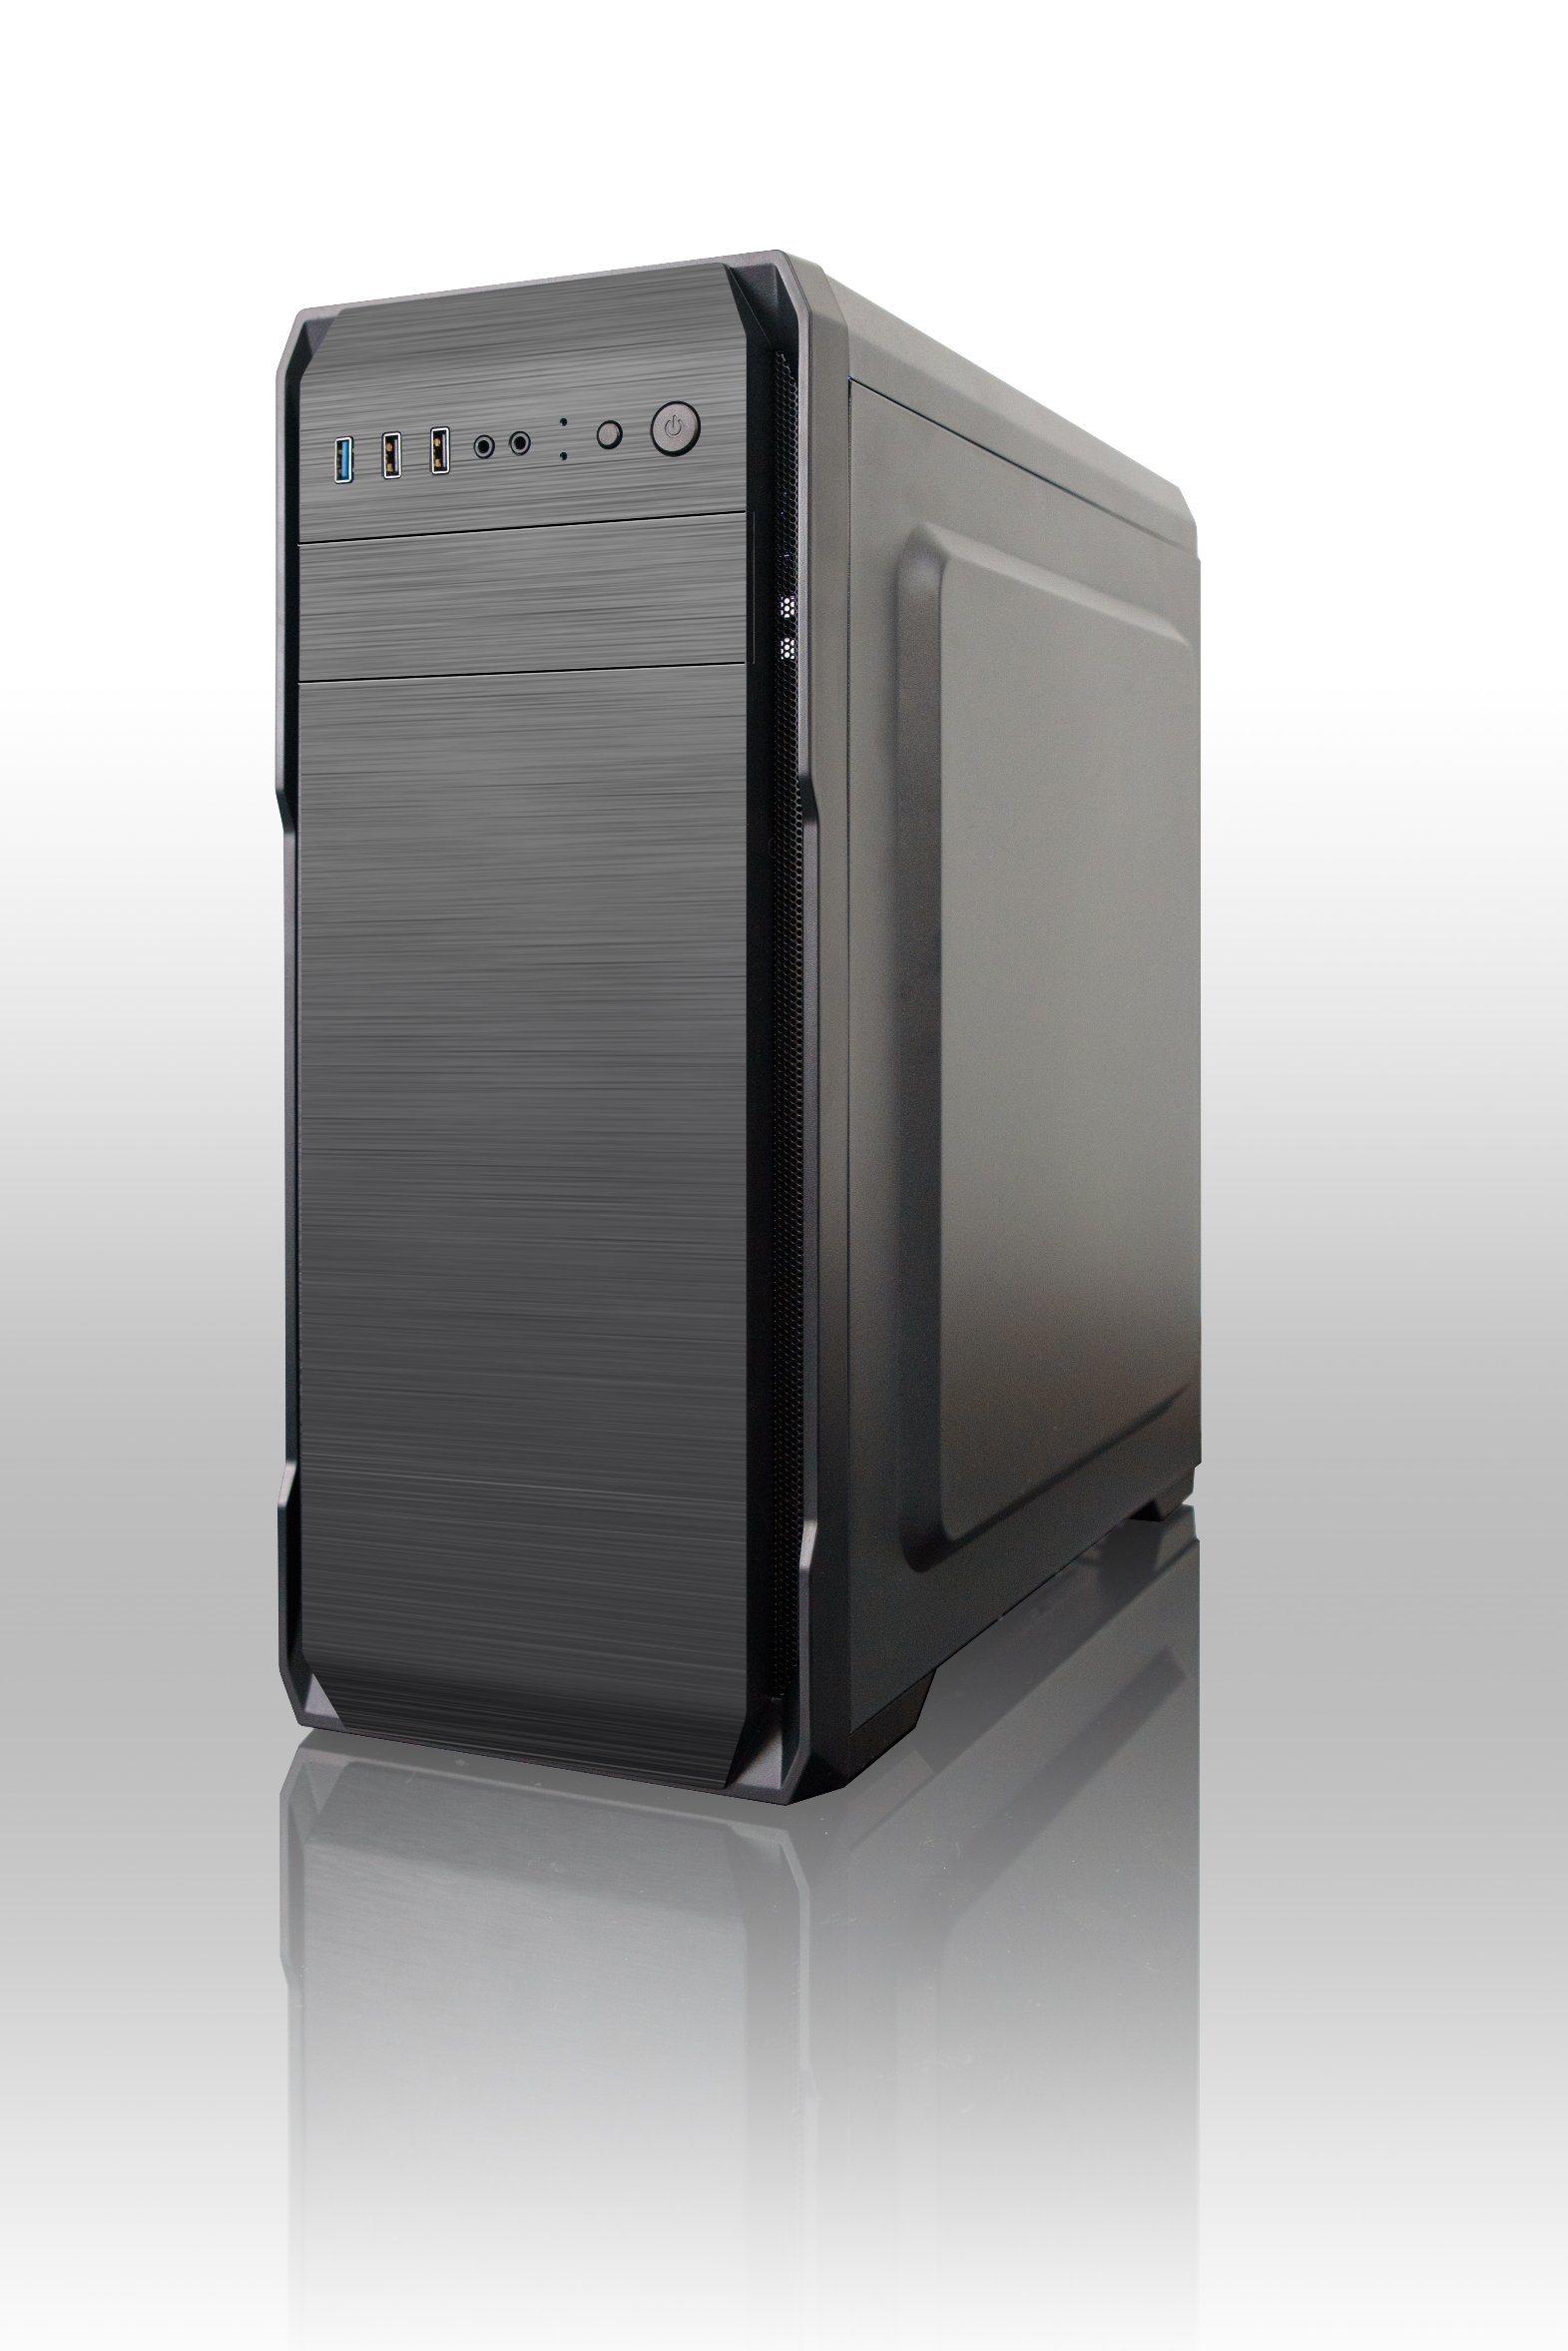 [Hot Item] New Design Best Selling RGB Gaming Computer Case PC Case Bottom  ATX Black